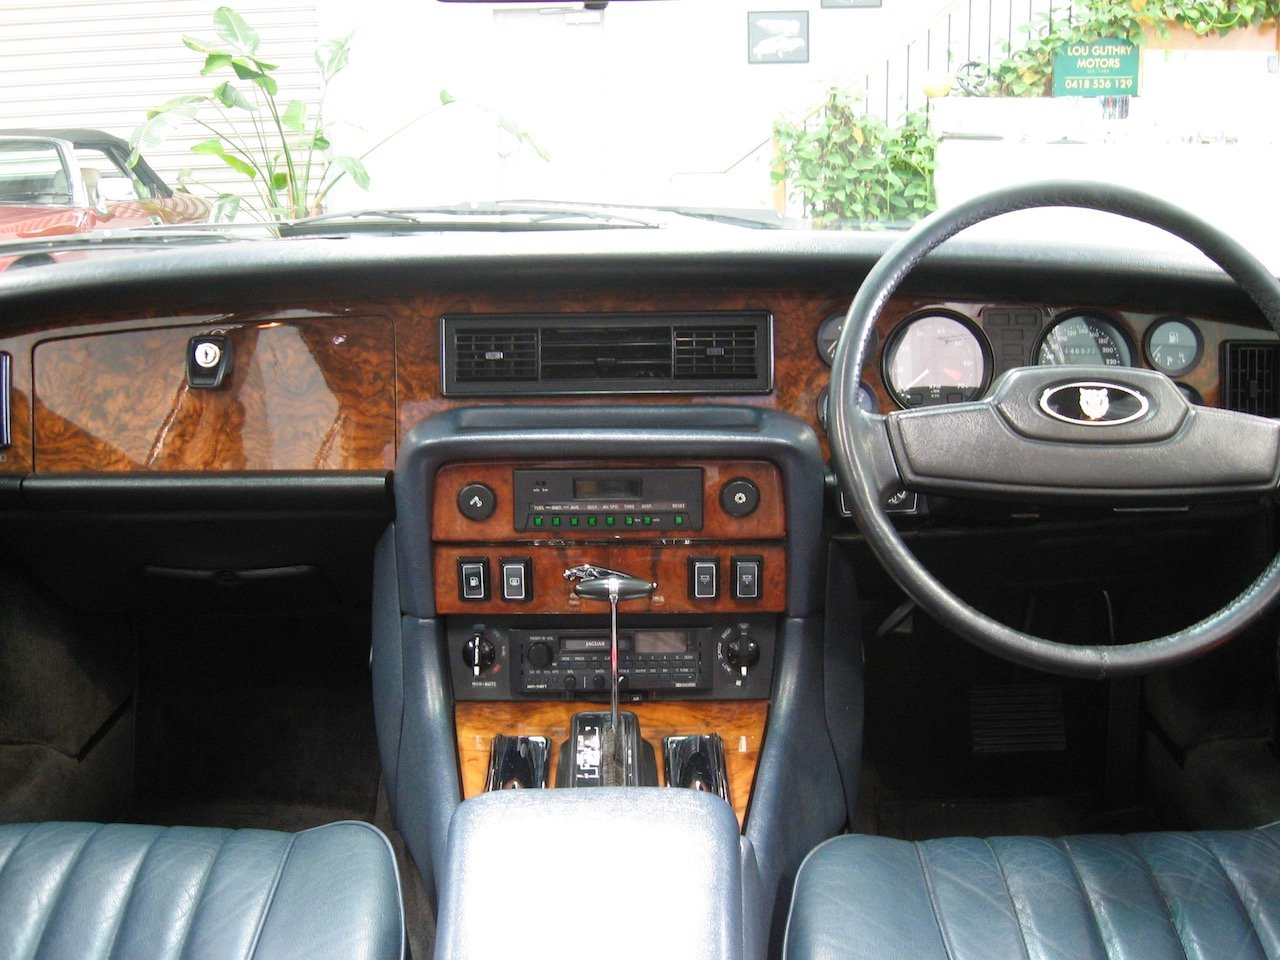 1988 Jaguar XJ12 Series 3 V12 Sovereign For Sale (picture 4 of 6)